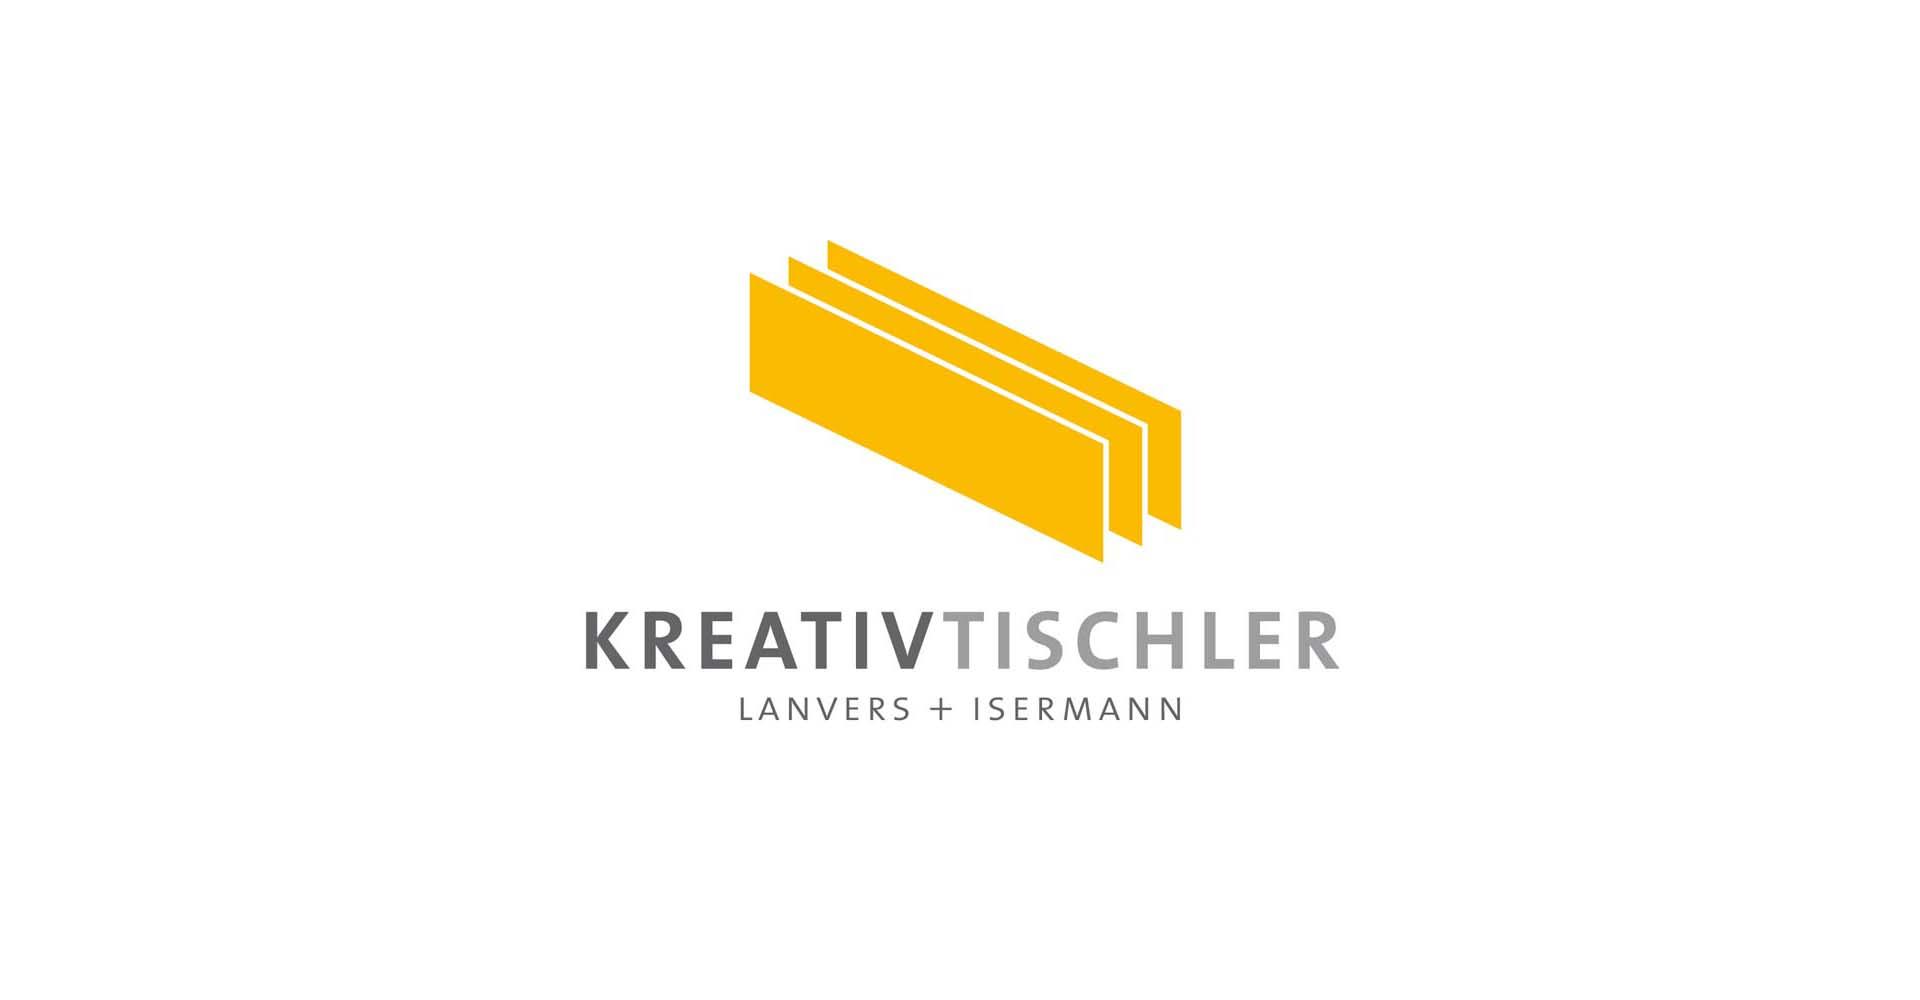 Logo-Design, Kreativtischler, Design, Logo, Münster, Grafik, Studio, Auckz